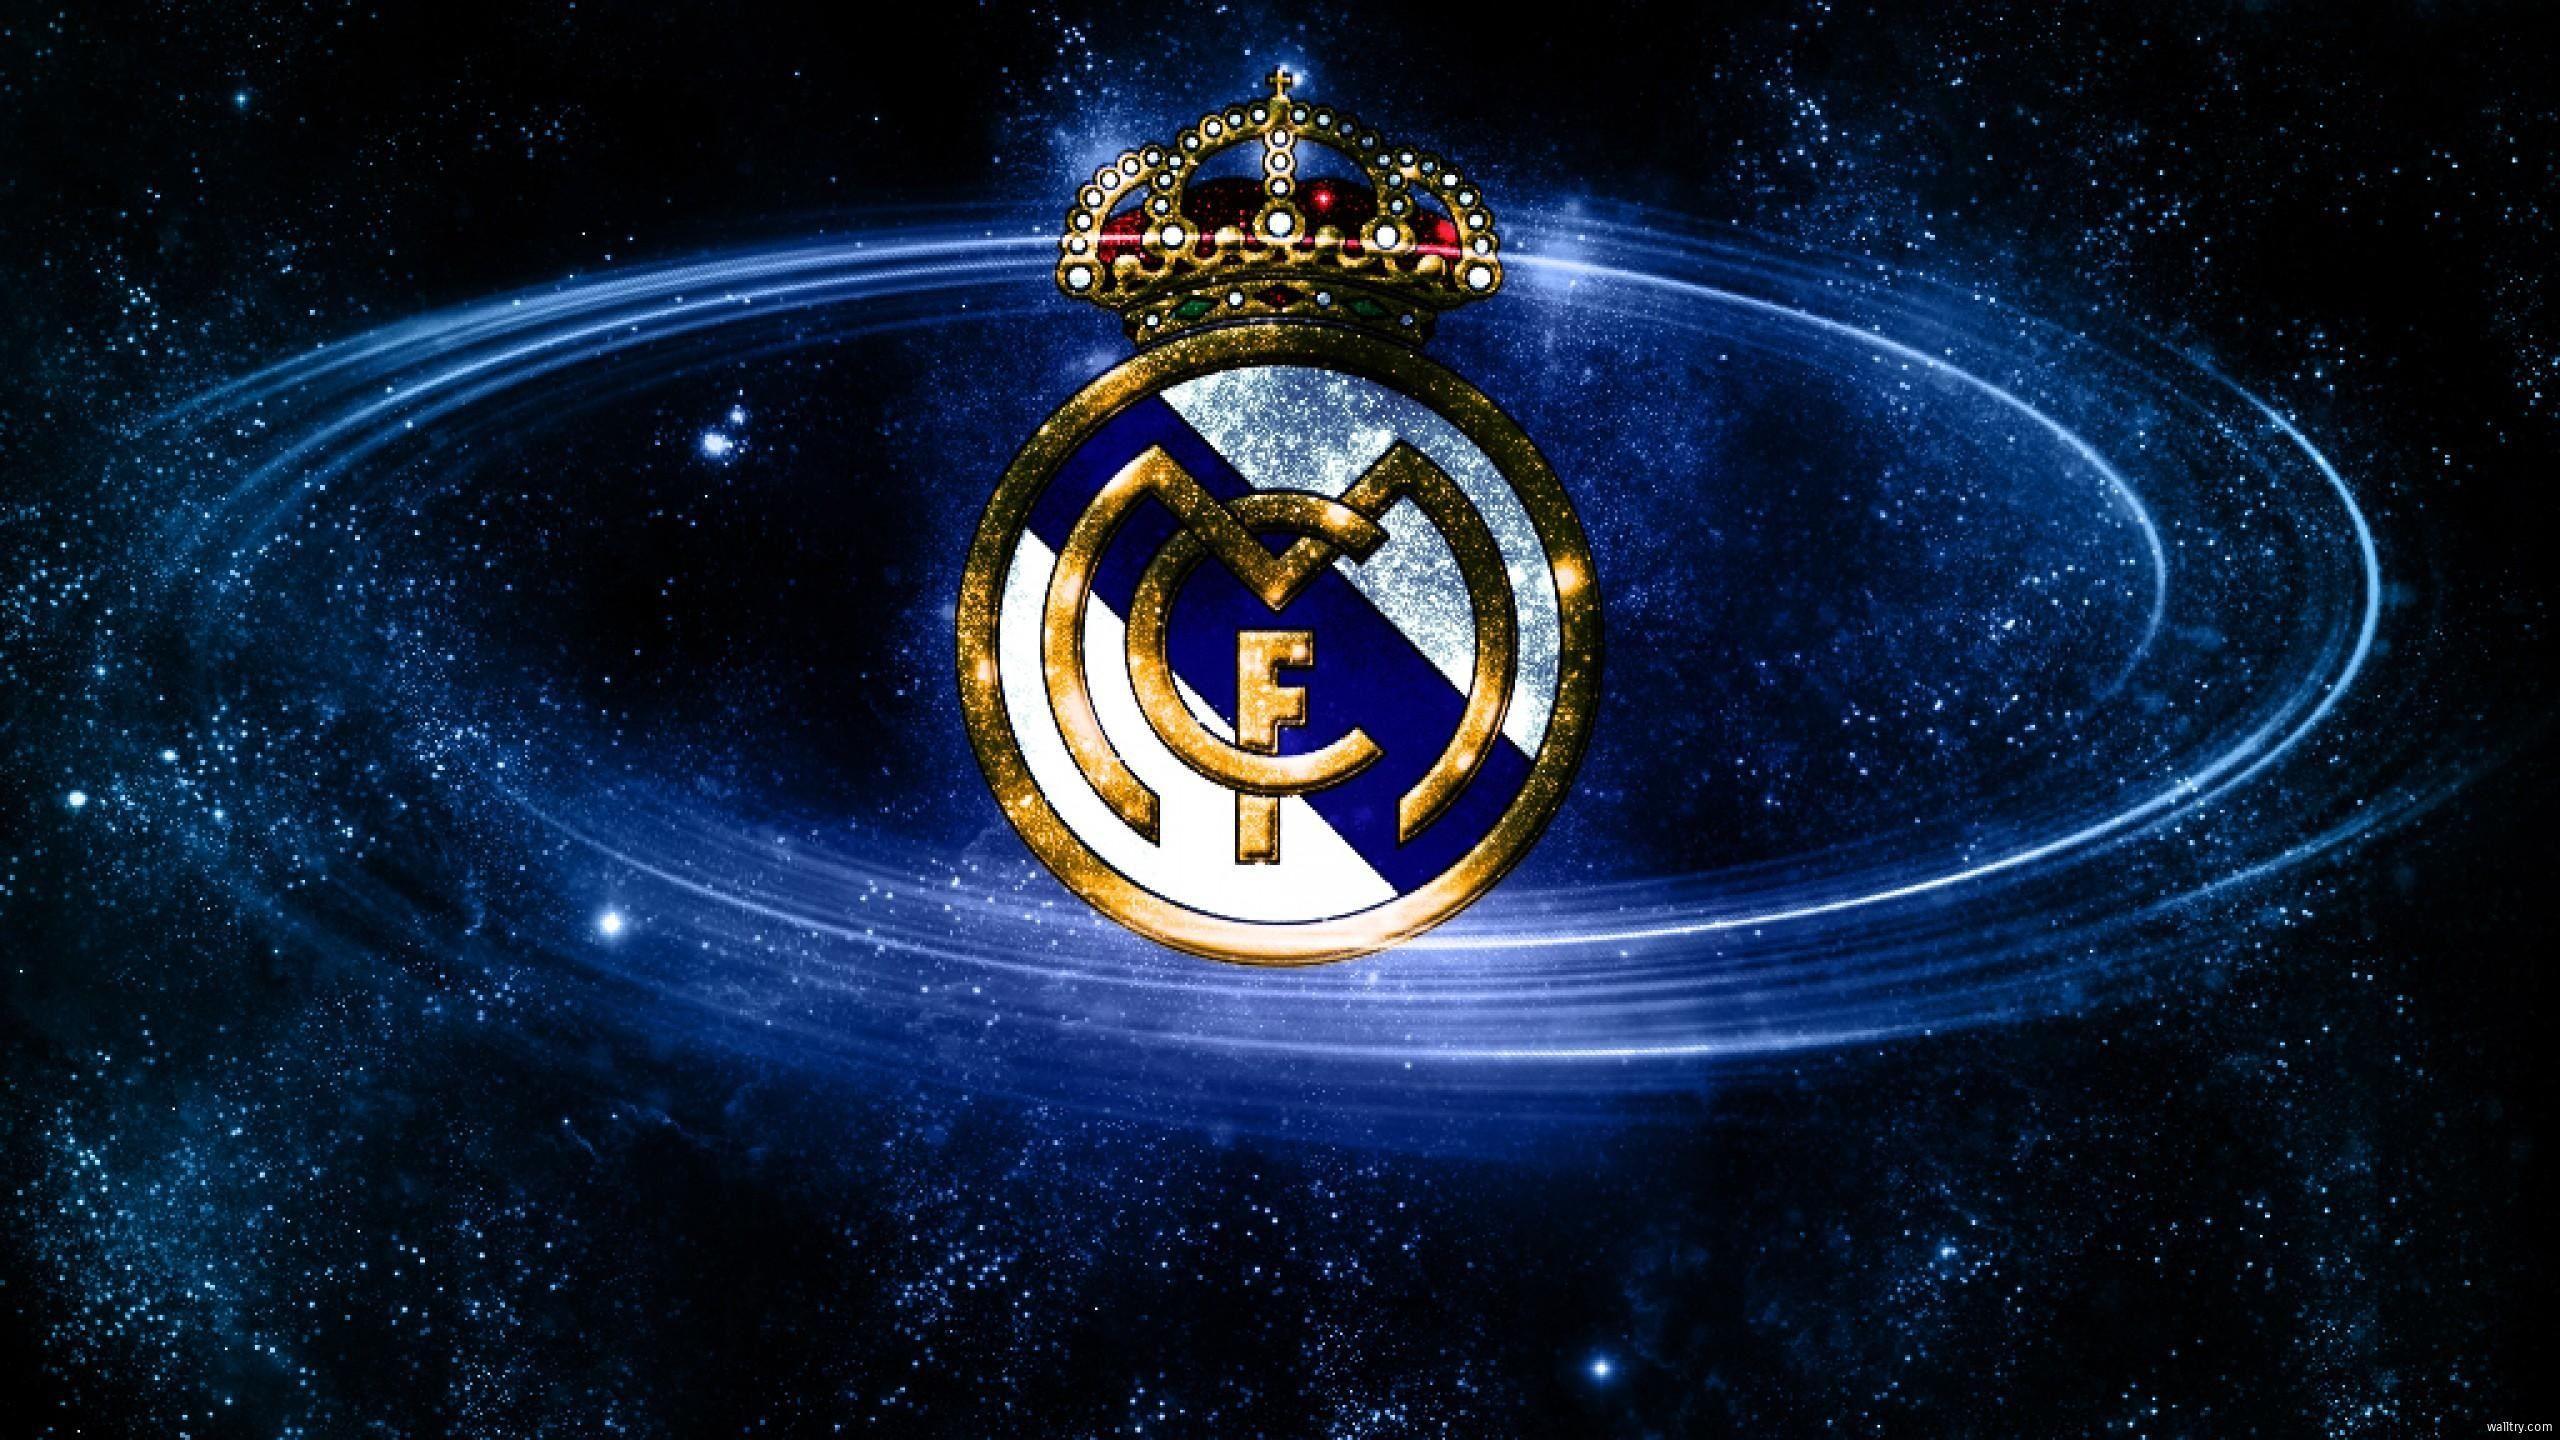 Wallpaper real madrid for windows xp - Fc Real Madrid Wallpaper Hd Pack 2560x1440 652 Kb